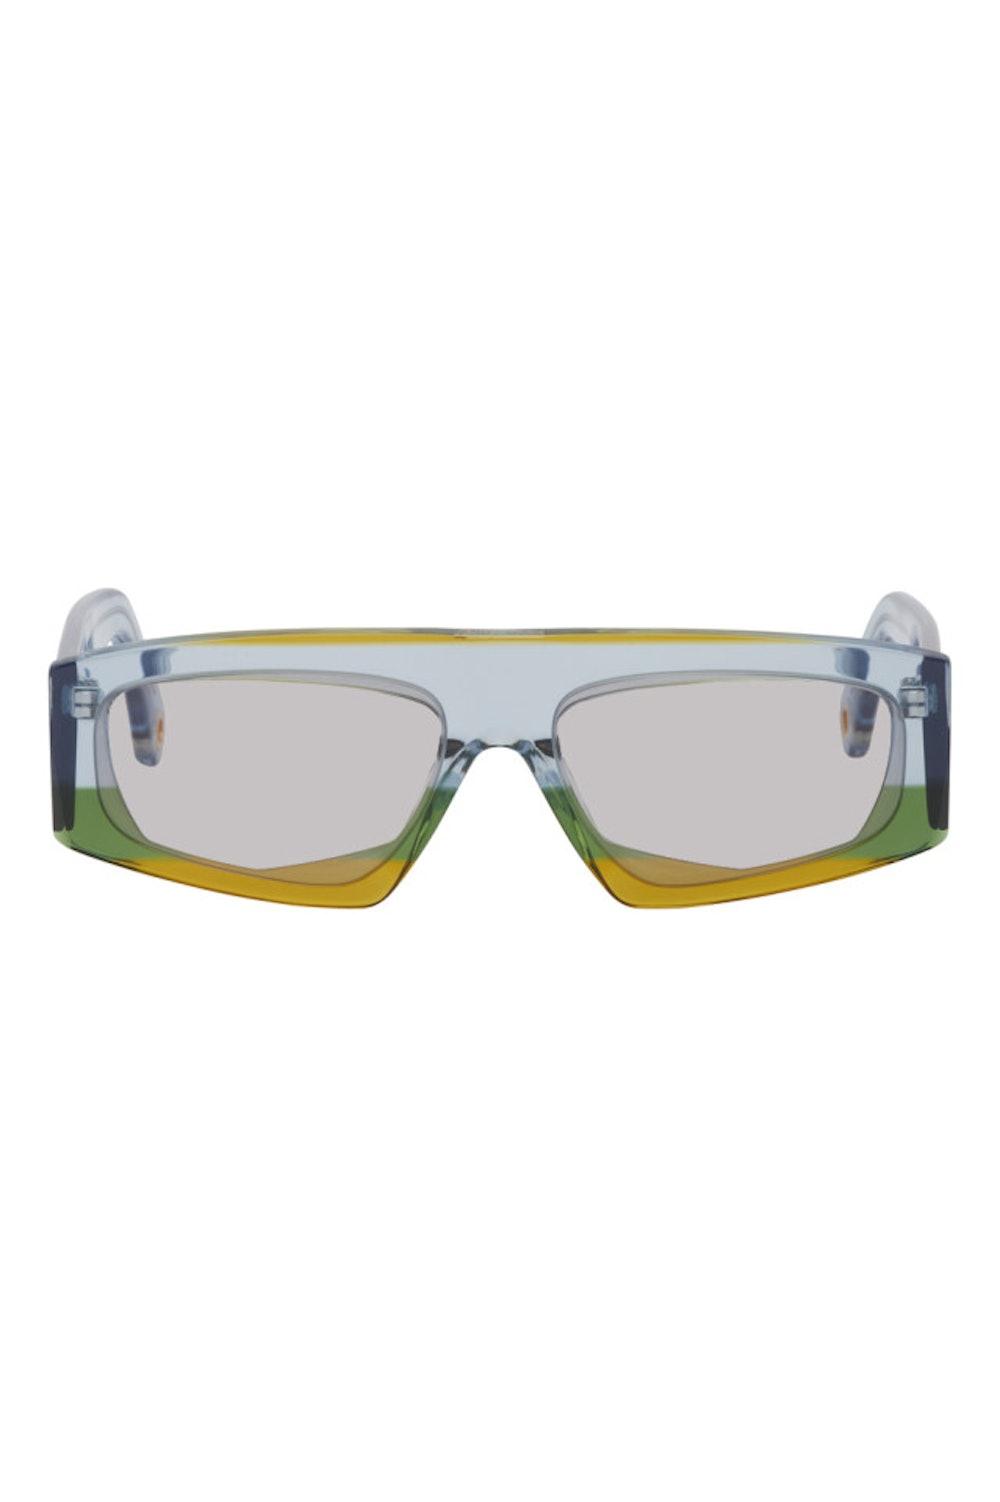 Yellow & Blue 'Les Lunettes Yauco' Sunglasses